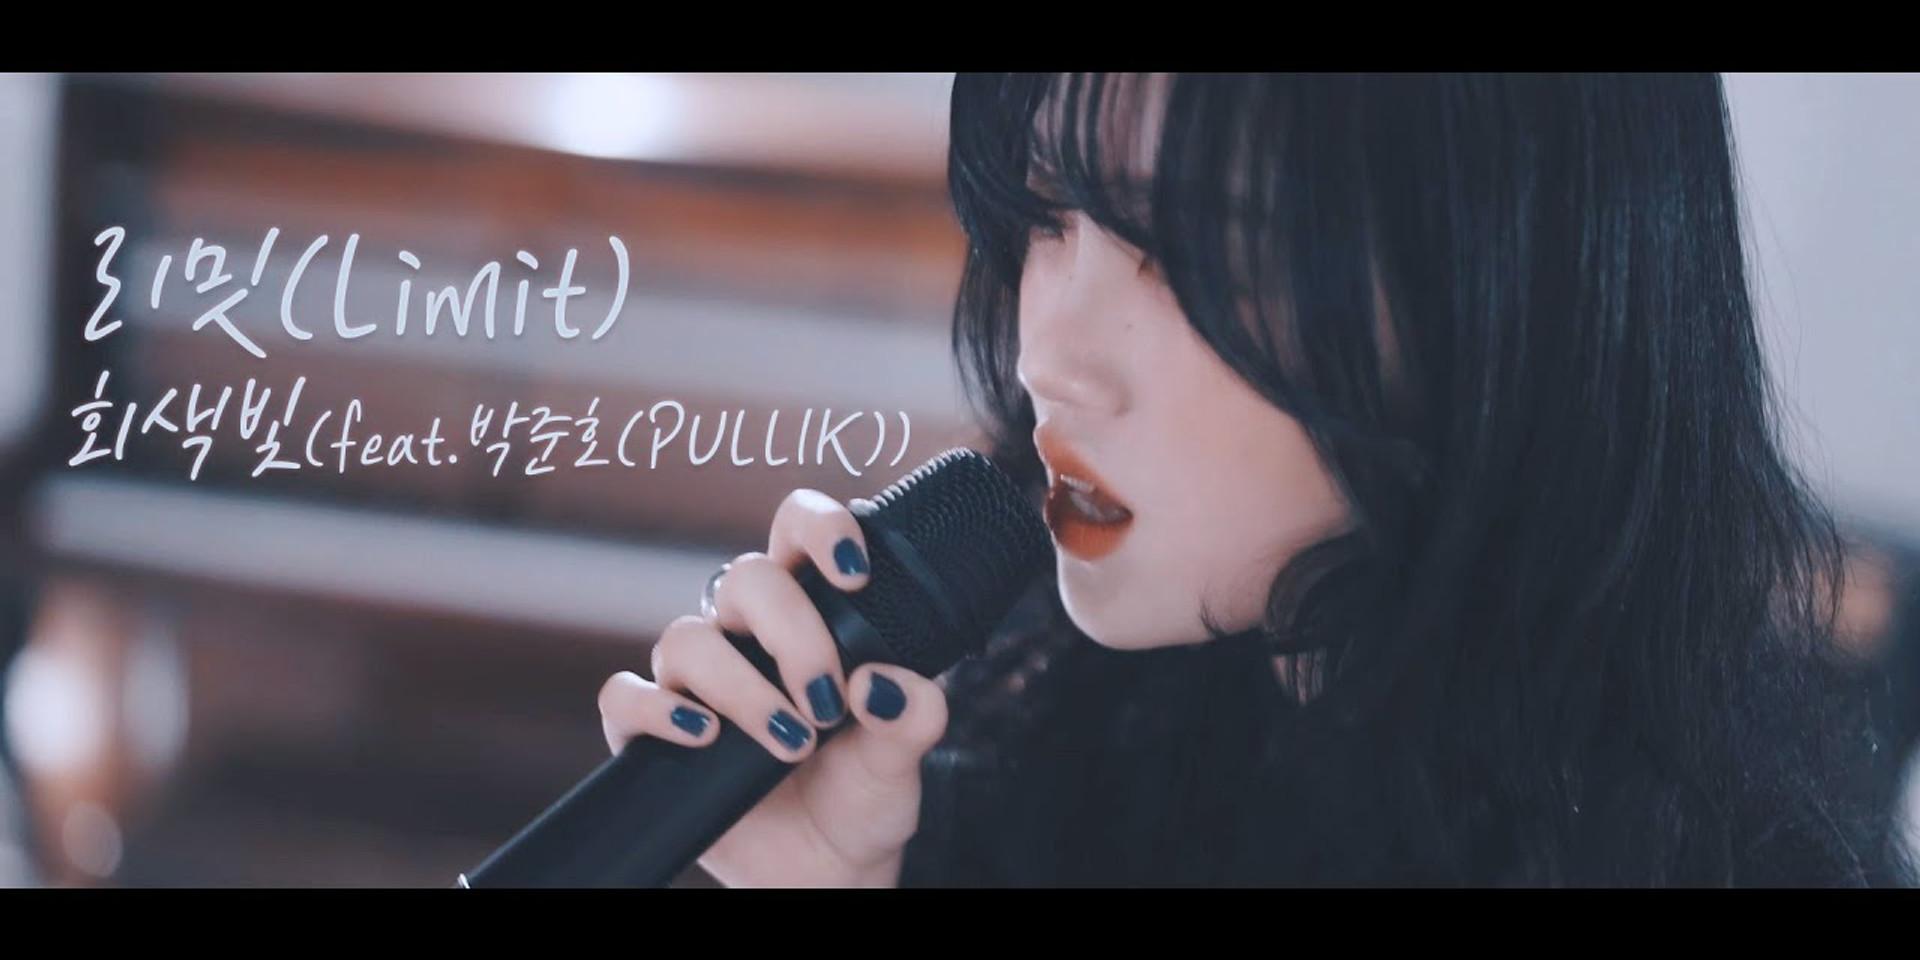 [LIVE CLIP] 리밋(Limit) - 회색빛(Feat.박준호(PULLIK))